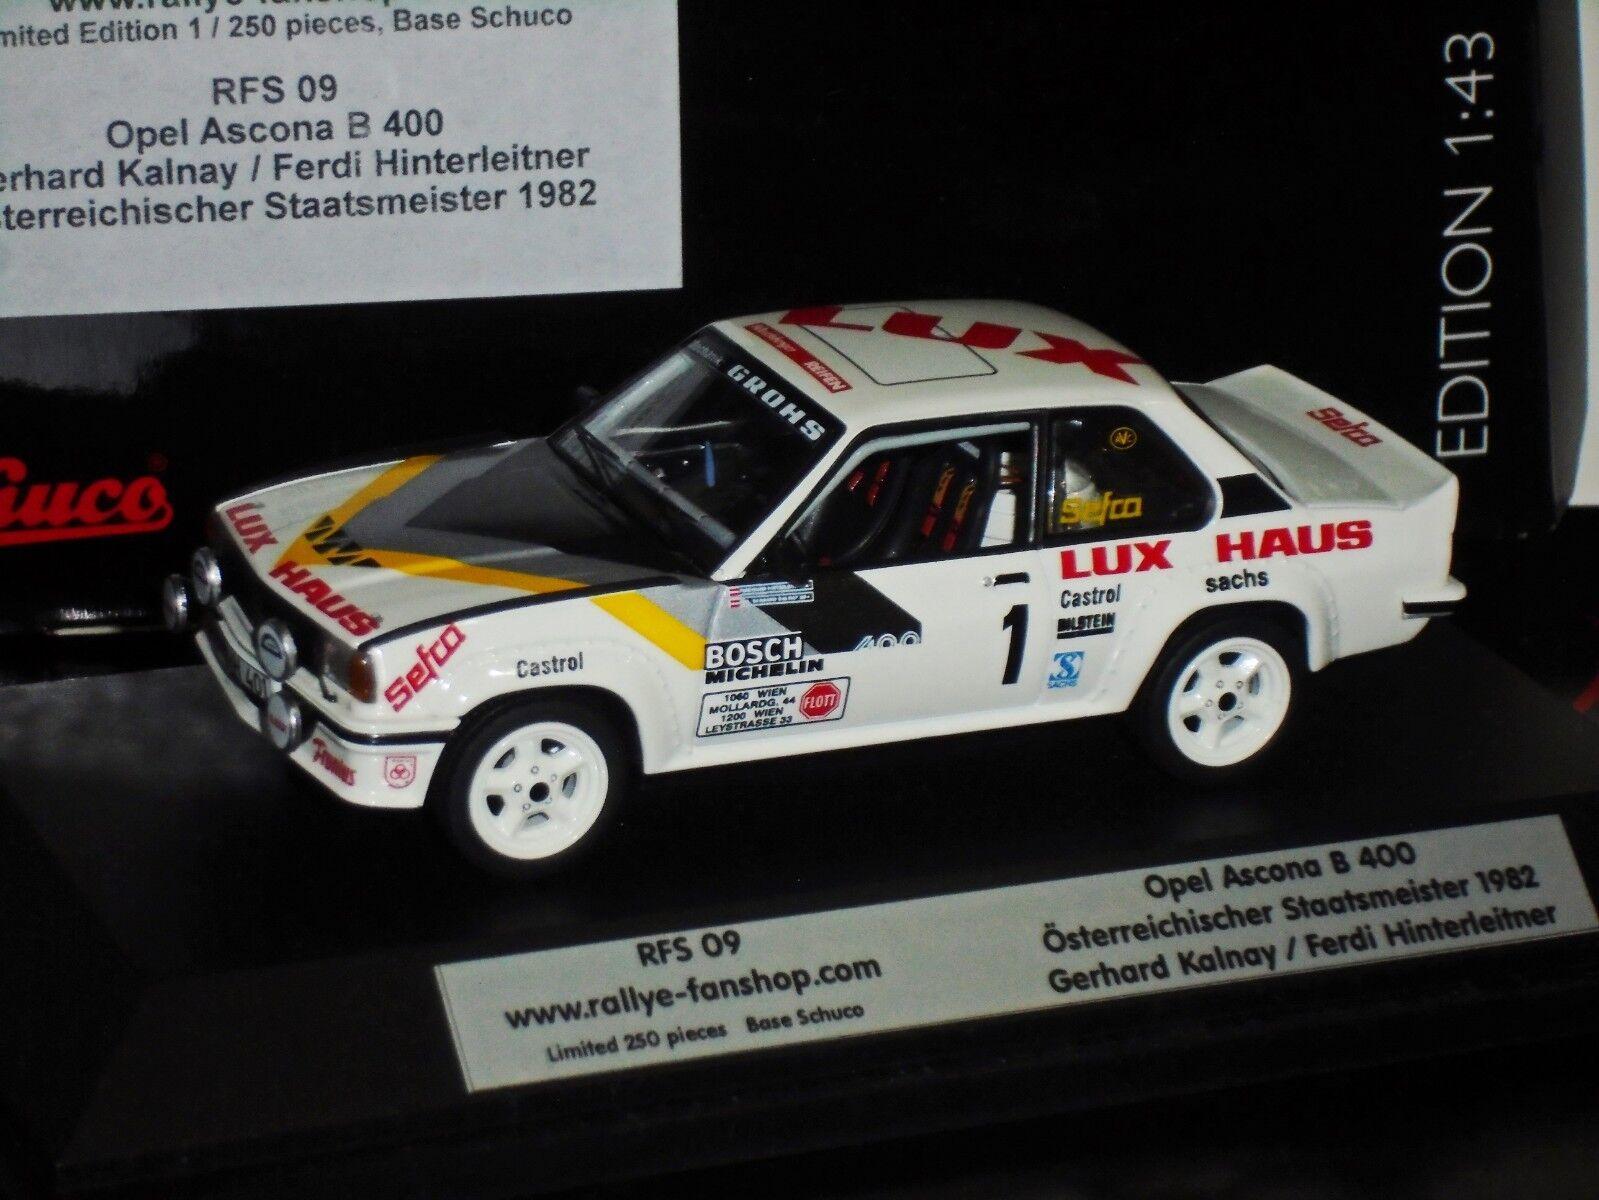 OPEL ASCONA B 400 AUSTRIAN CHAMPION 1982 KALNAY LIM. SCHUCO RFS09 1 43